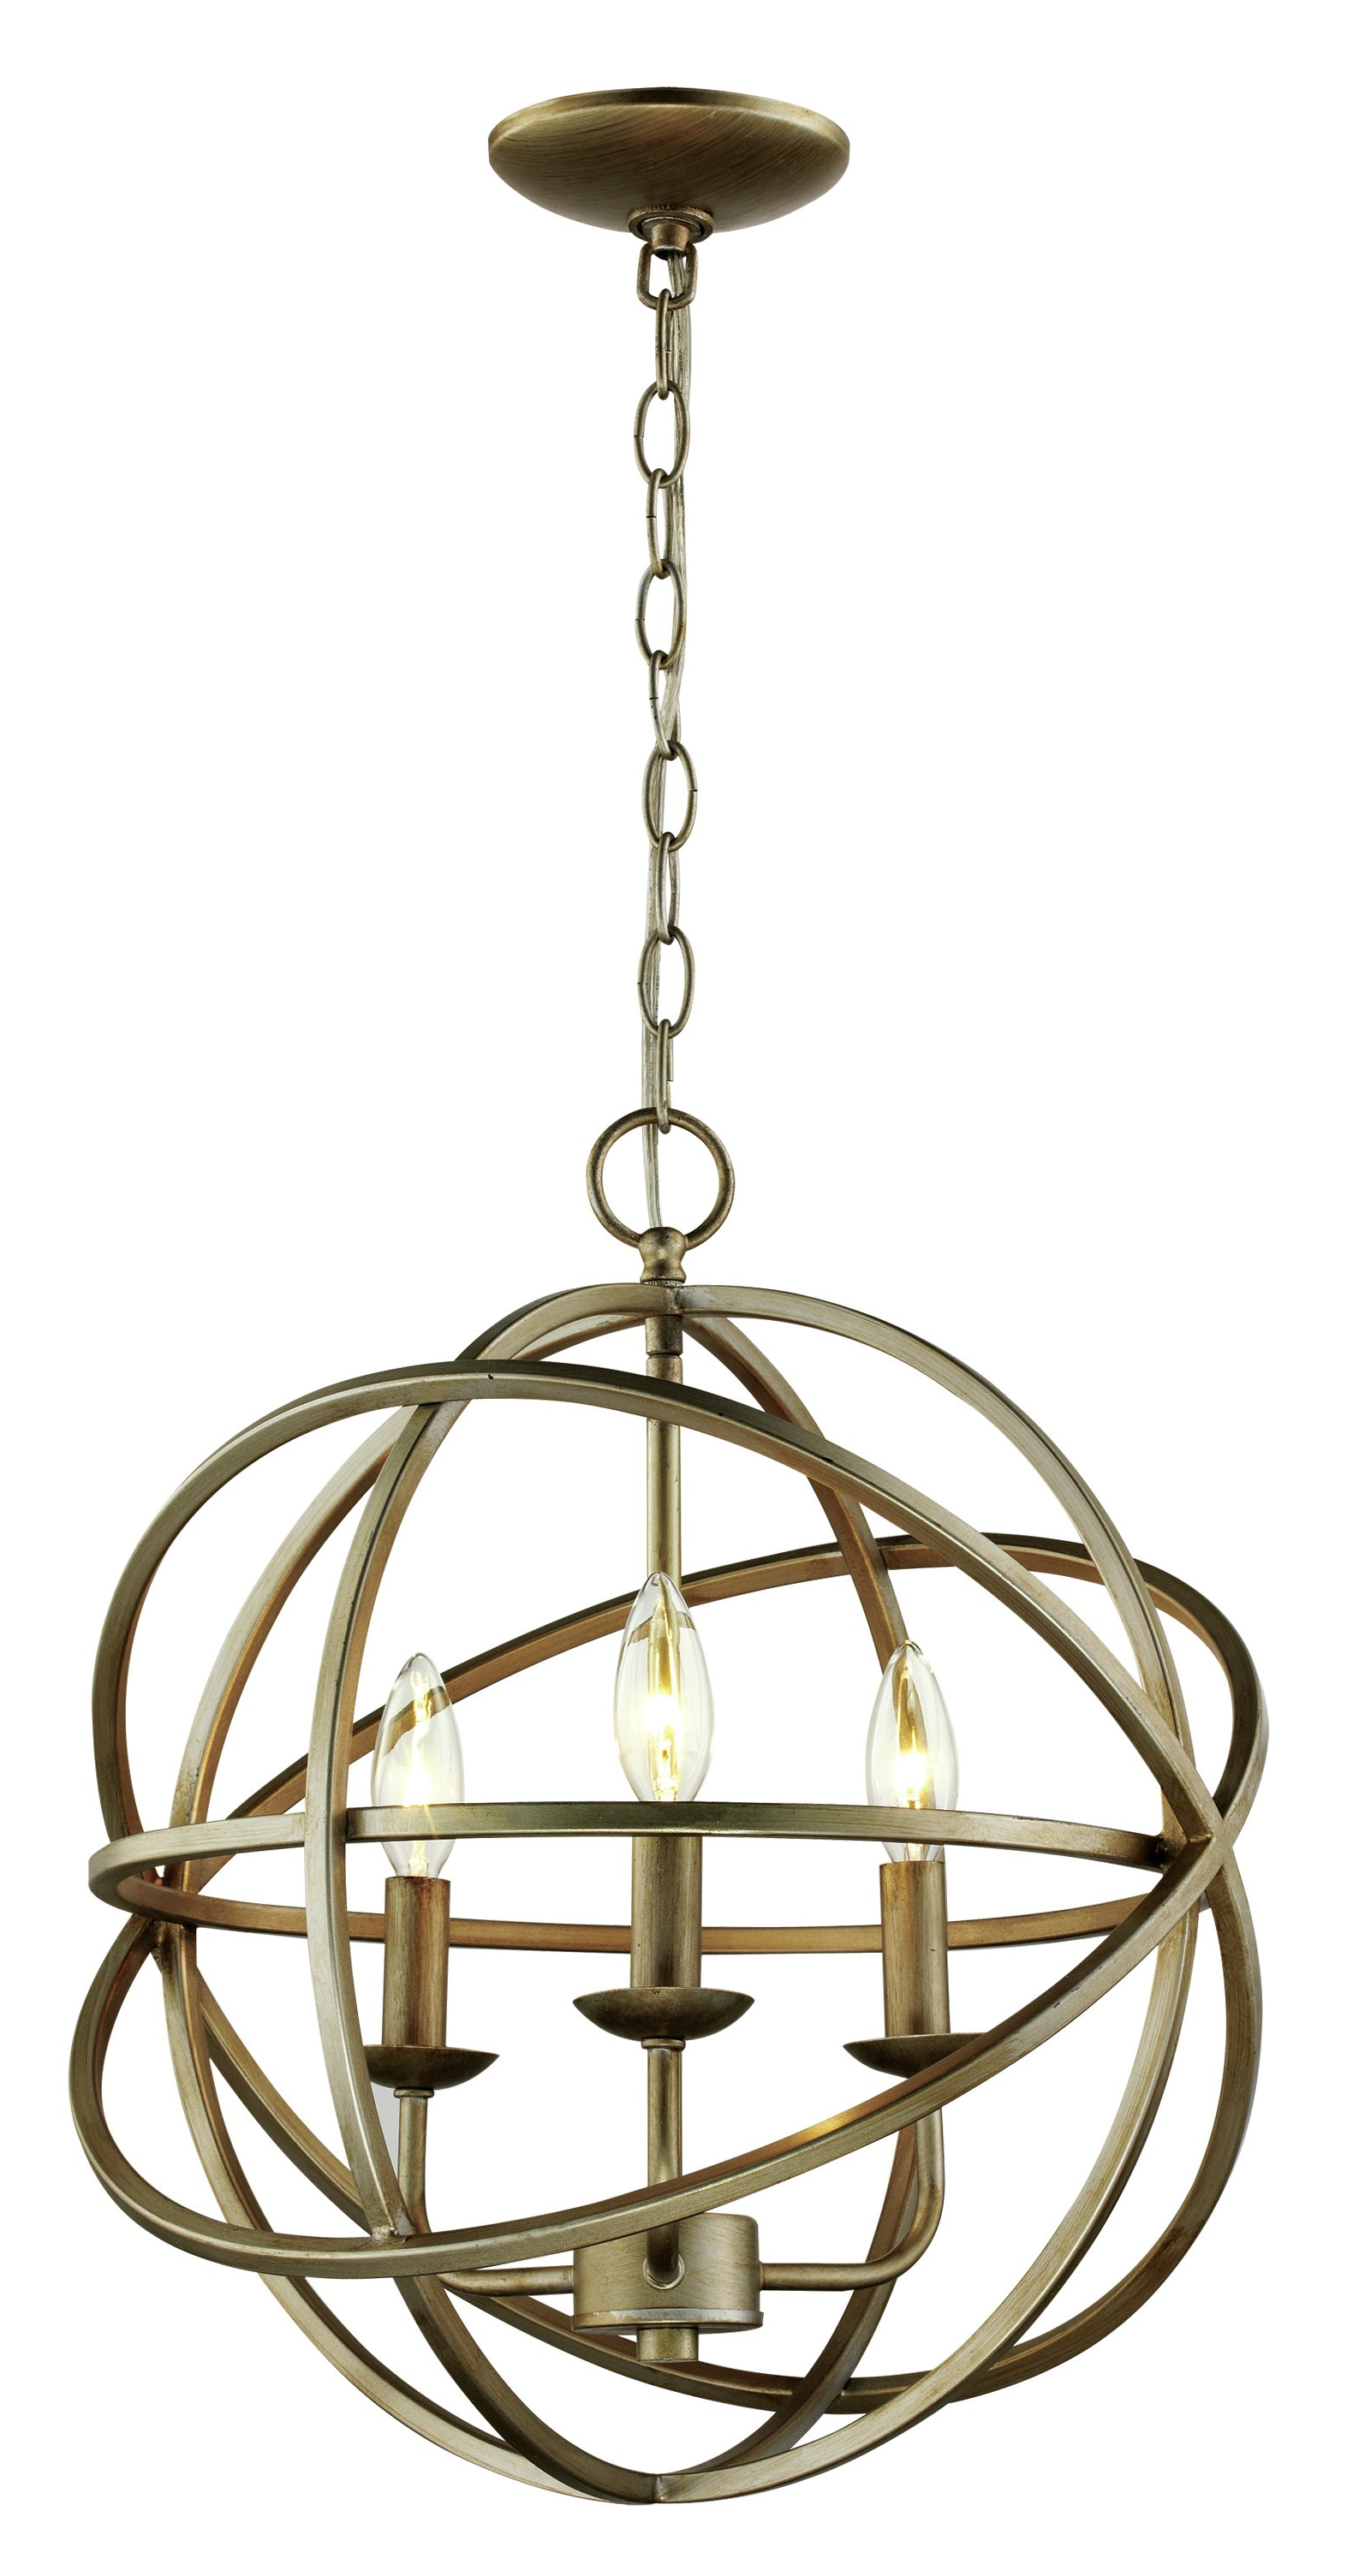 2019 Shipststour 3 Light Globe Chandeliers Regarding Baitz 3 Light Globe Chandelier (View 2 of 20)